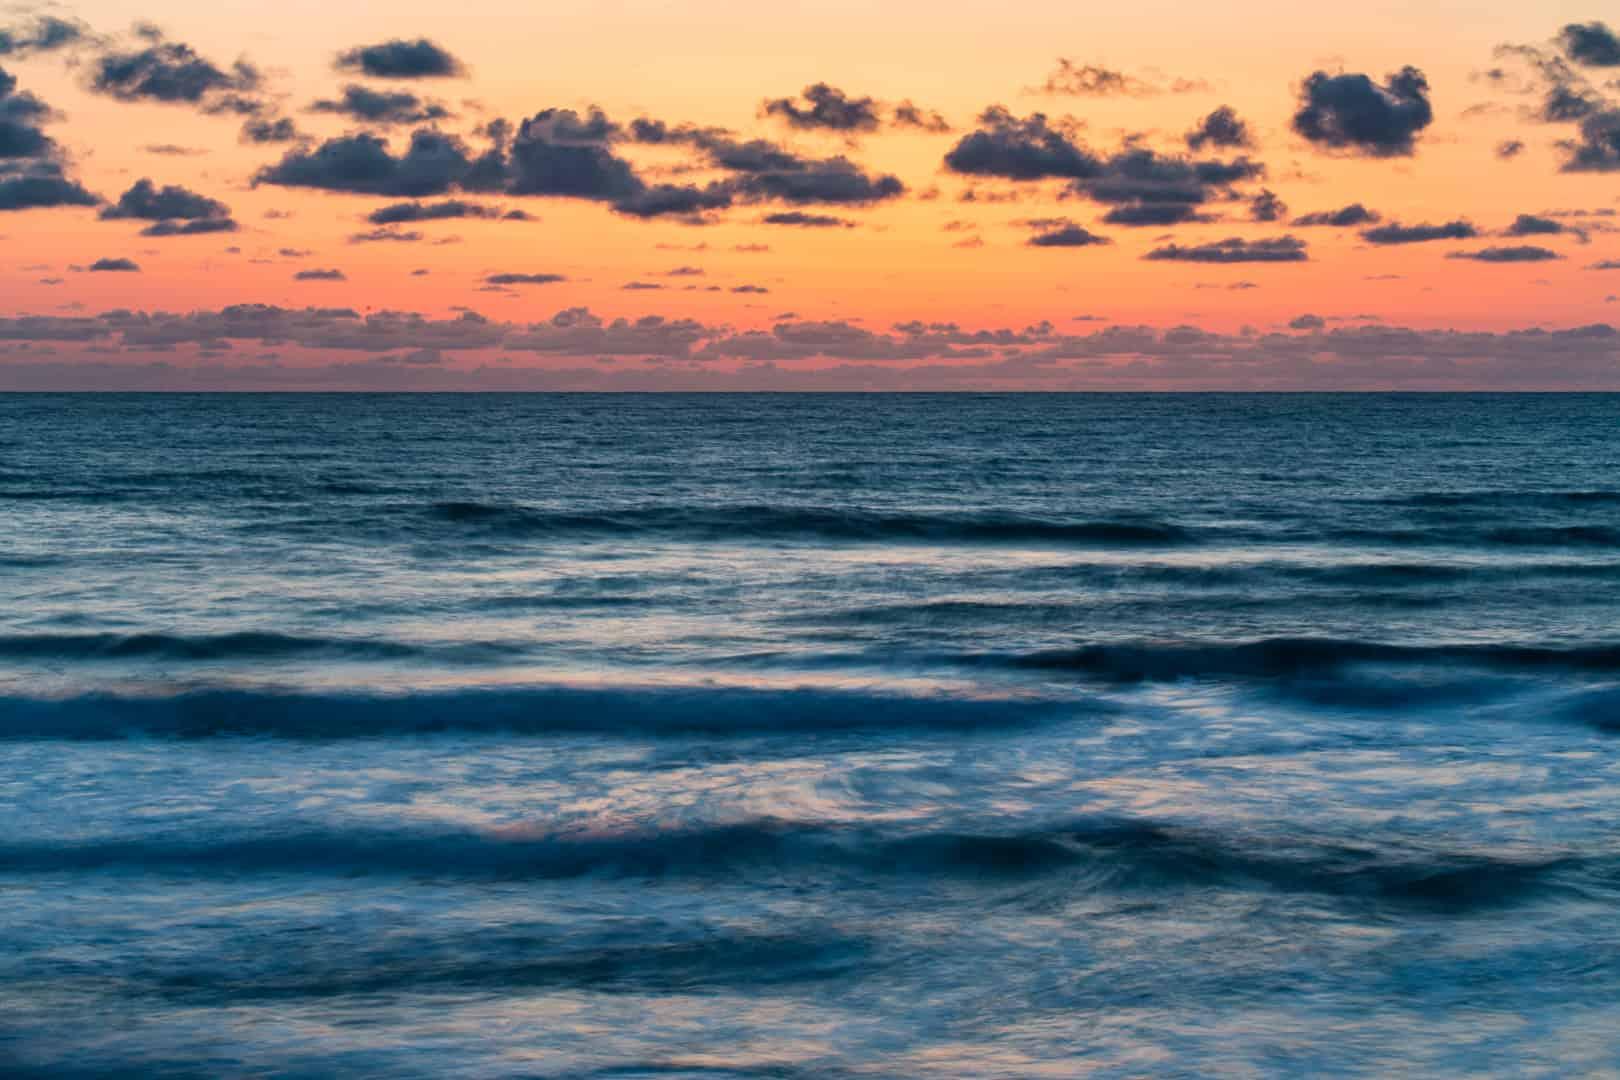 Sunset, Ten Mile Beach, April 2017